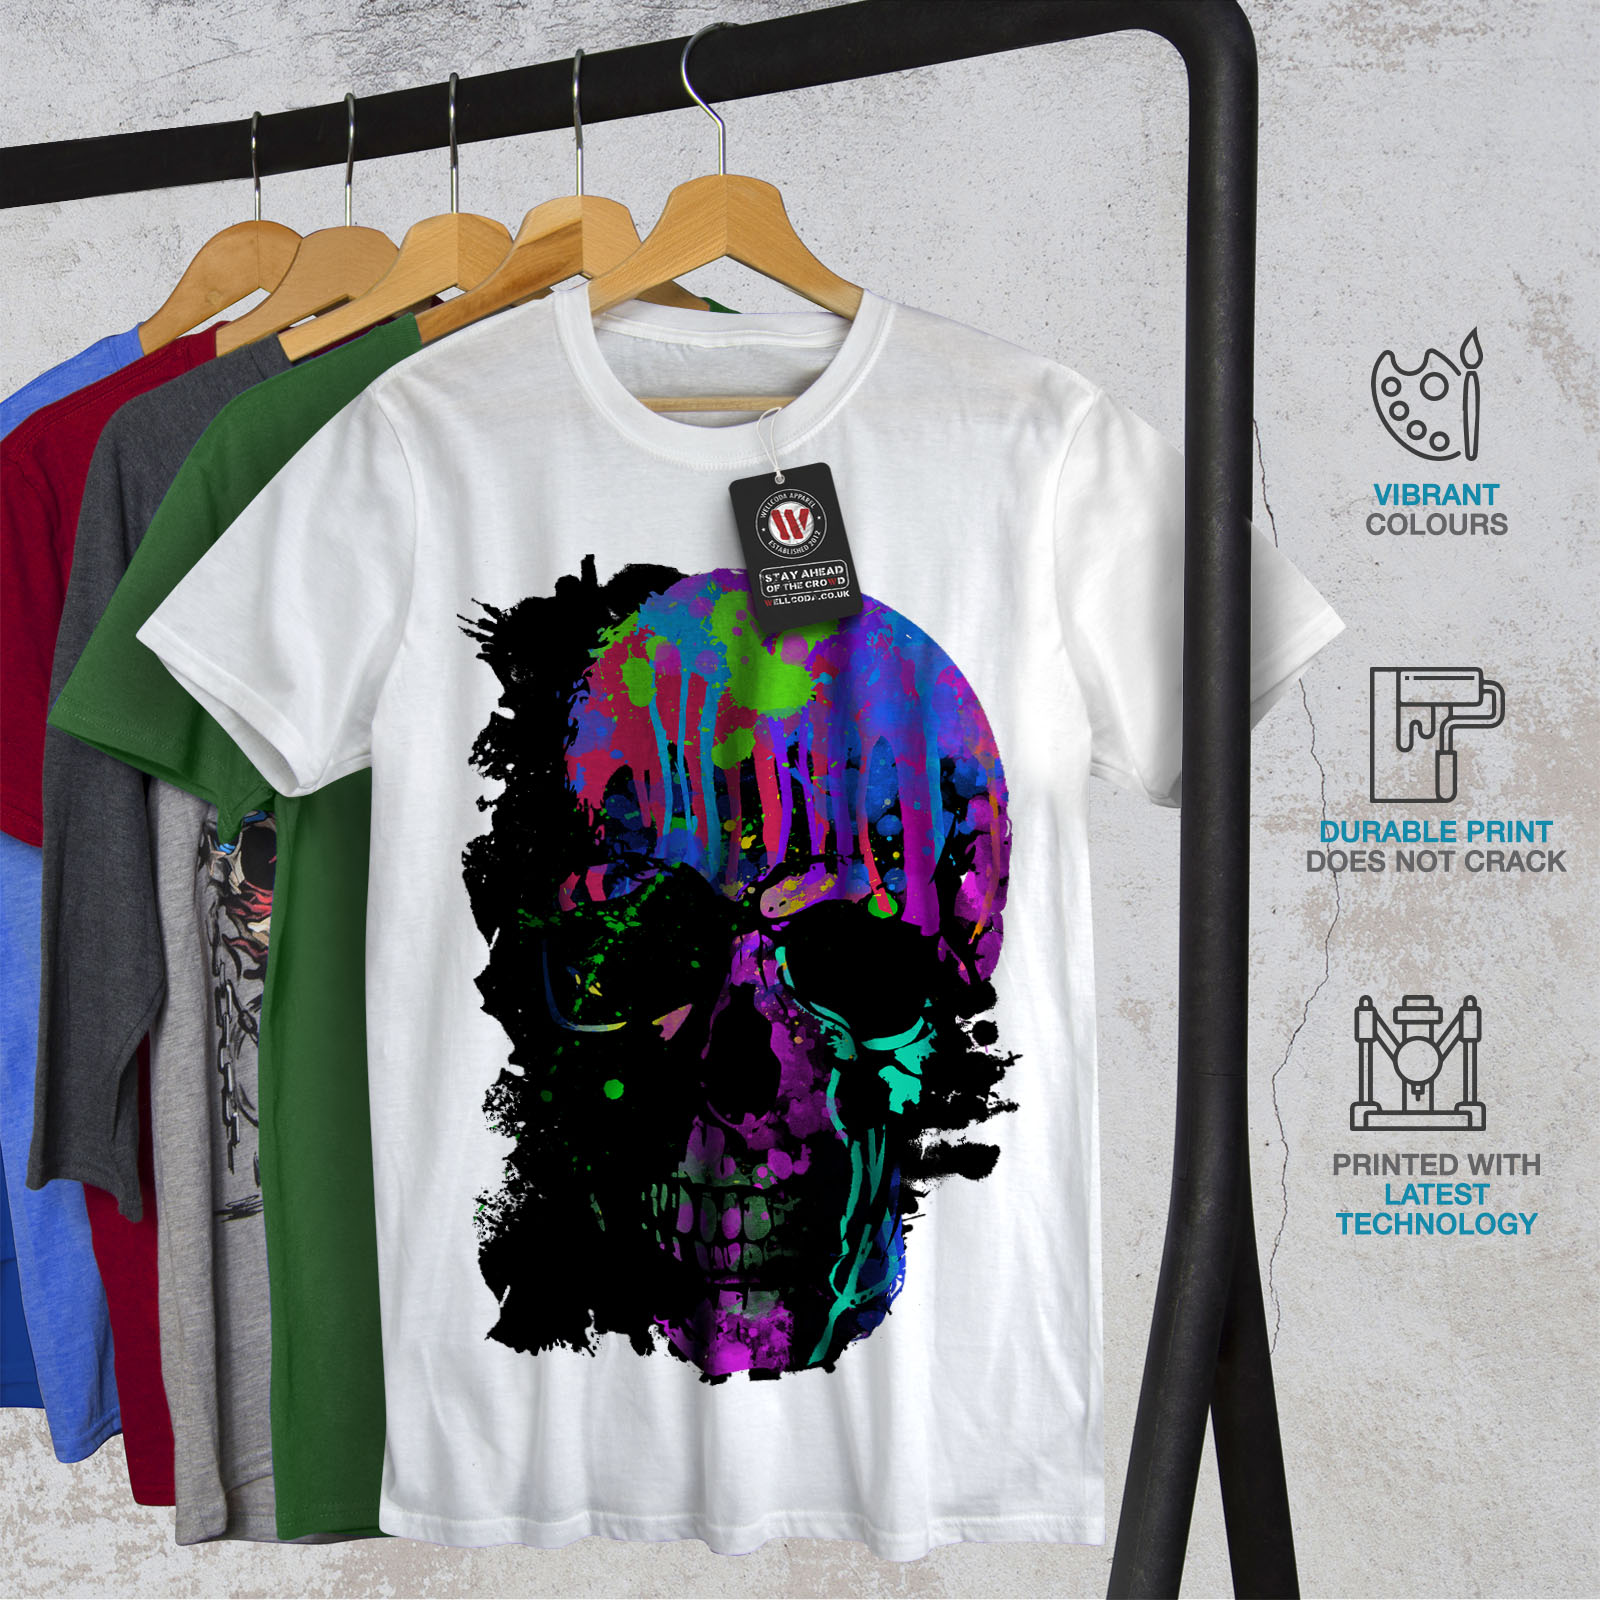 Wellcoda-Skull-Artsy-Mens-T-shirt-Neon-Night-Graphic-Design-Printed-Tee thumbnail 12